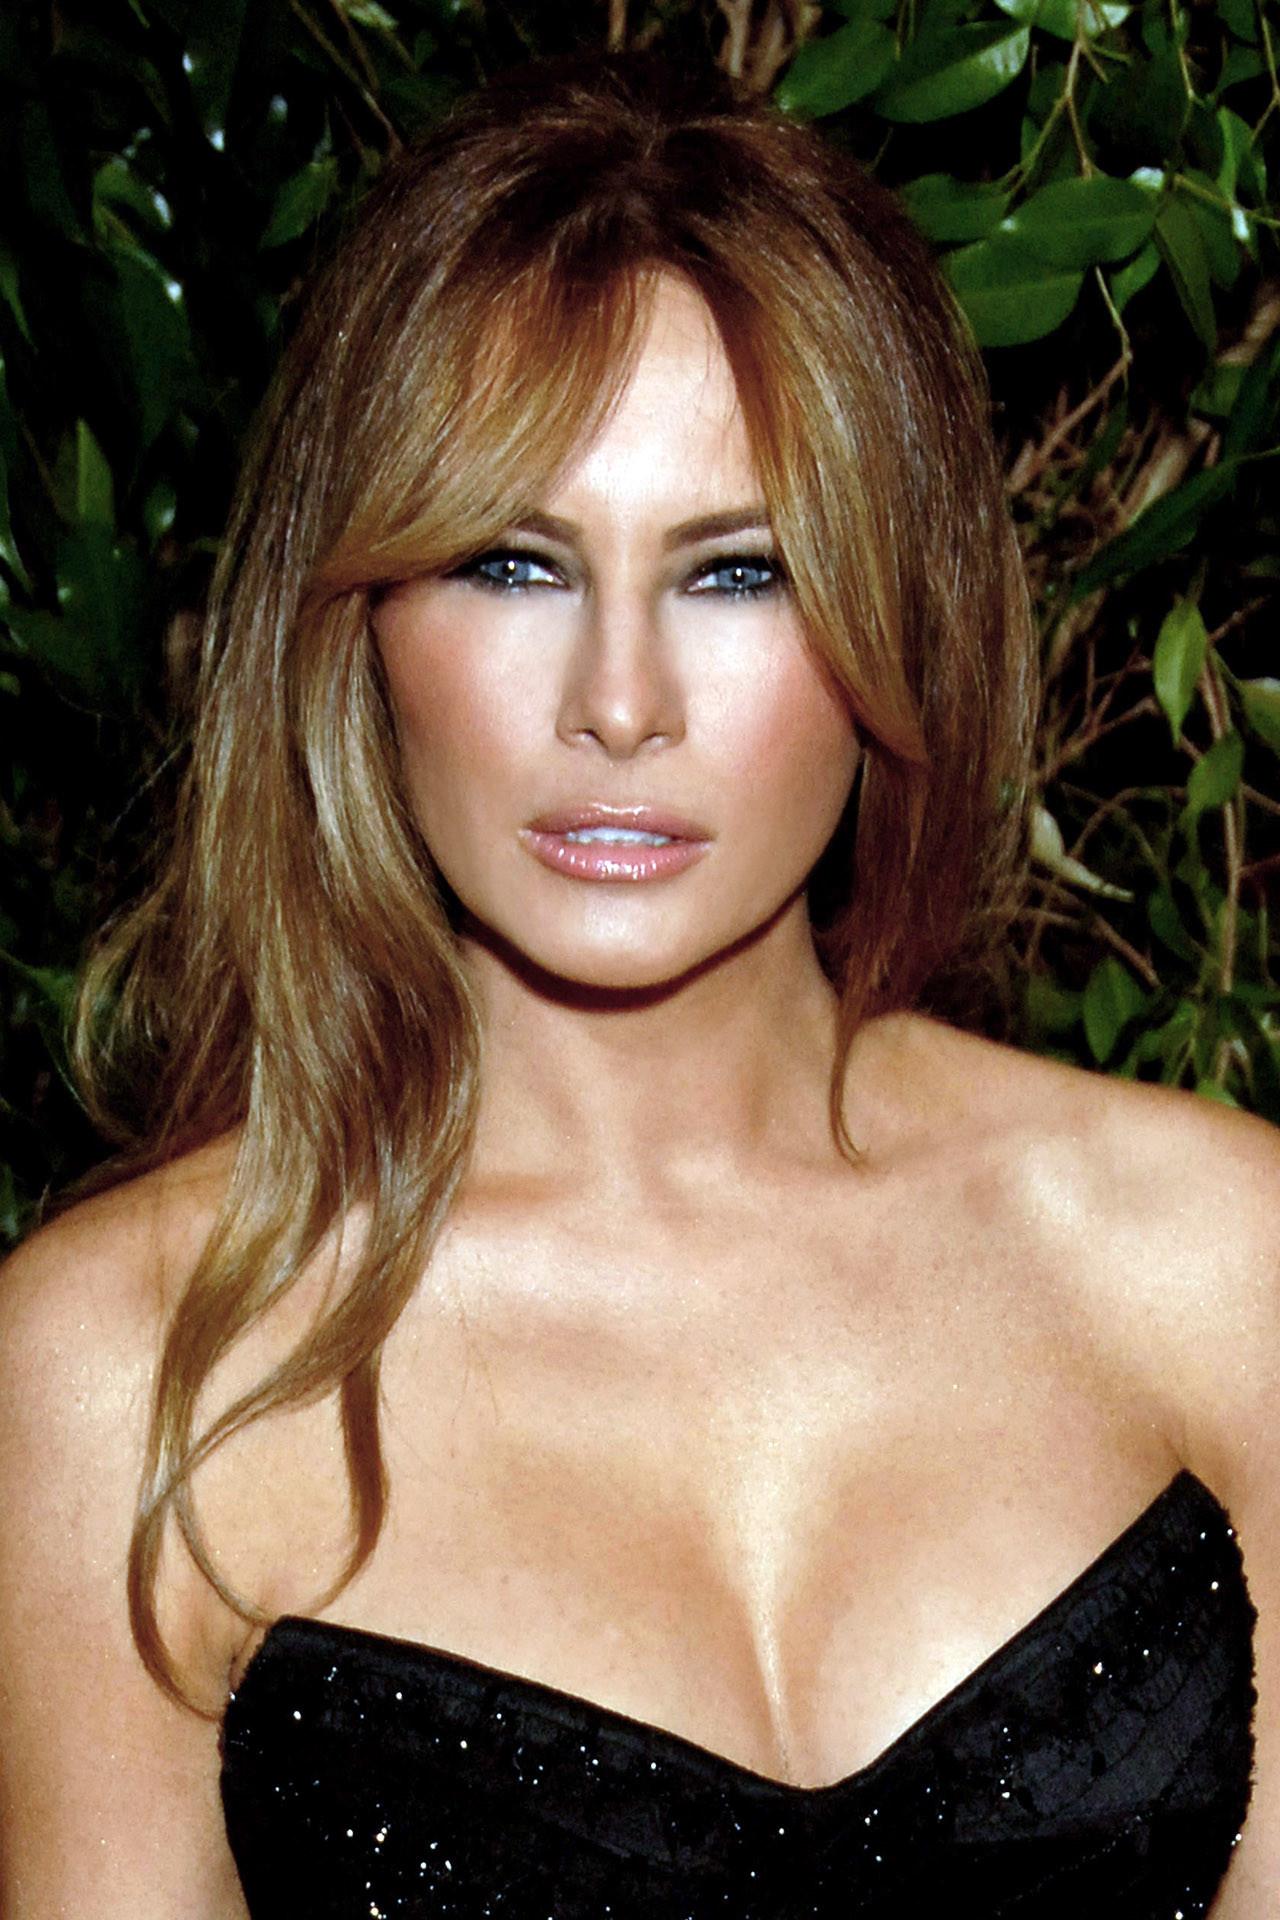 Donald Trump current wife Melania